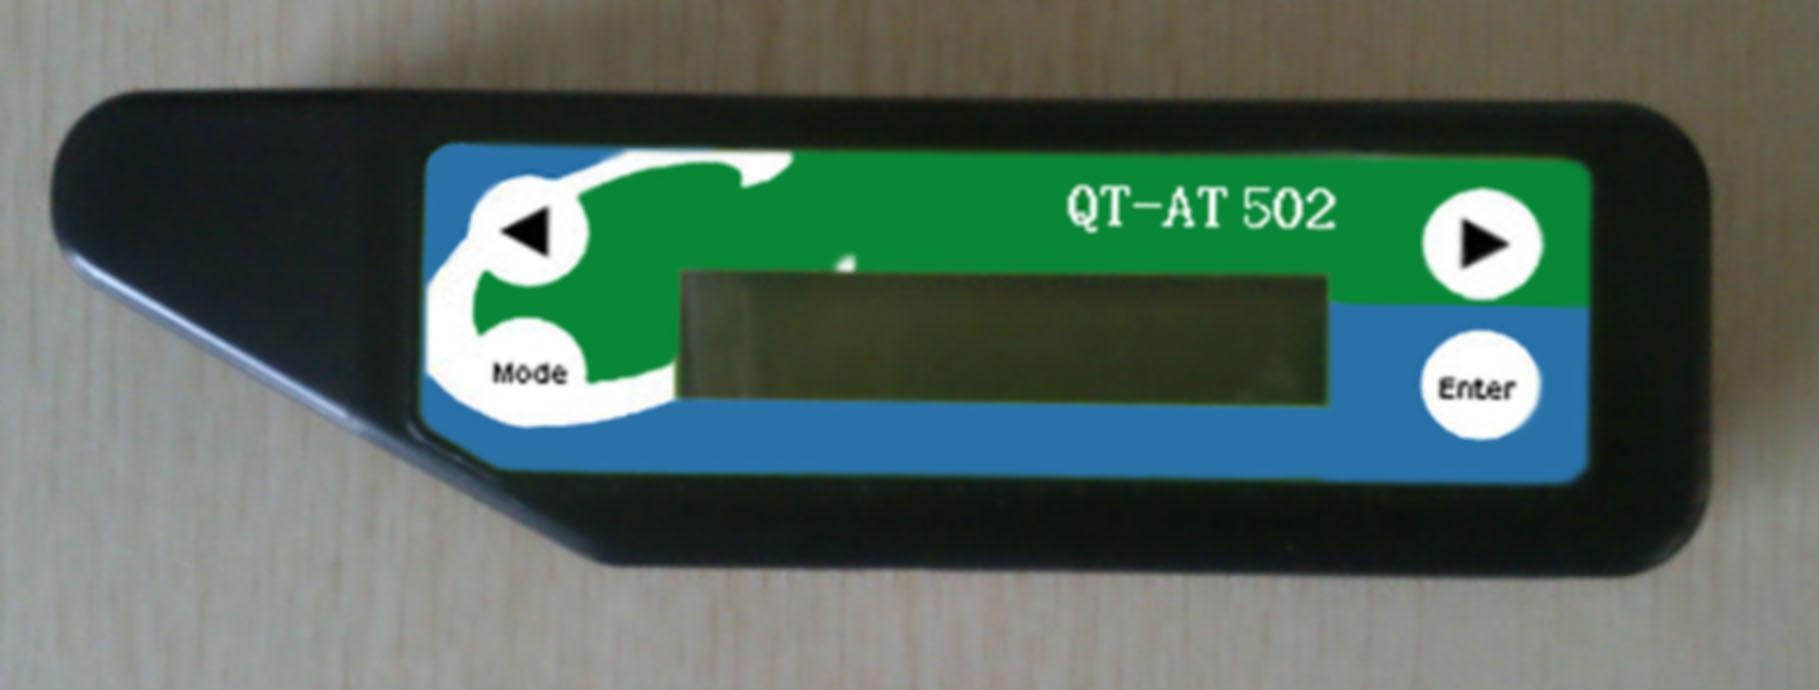 QT-AT 502 Portable Chlorophyll Meter